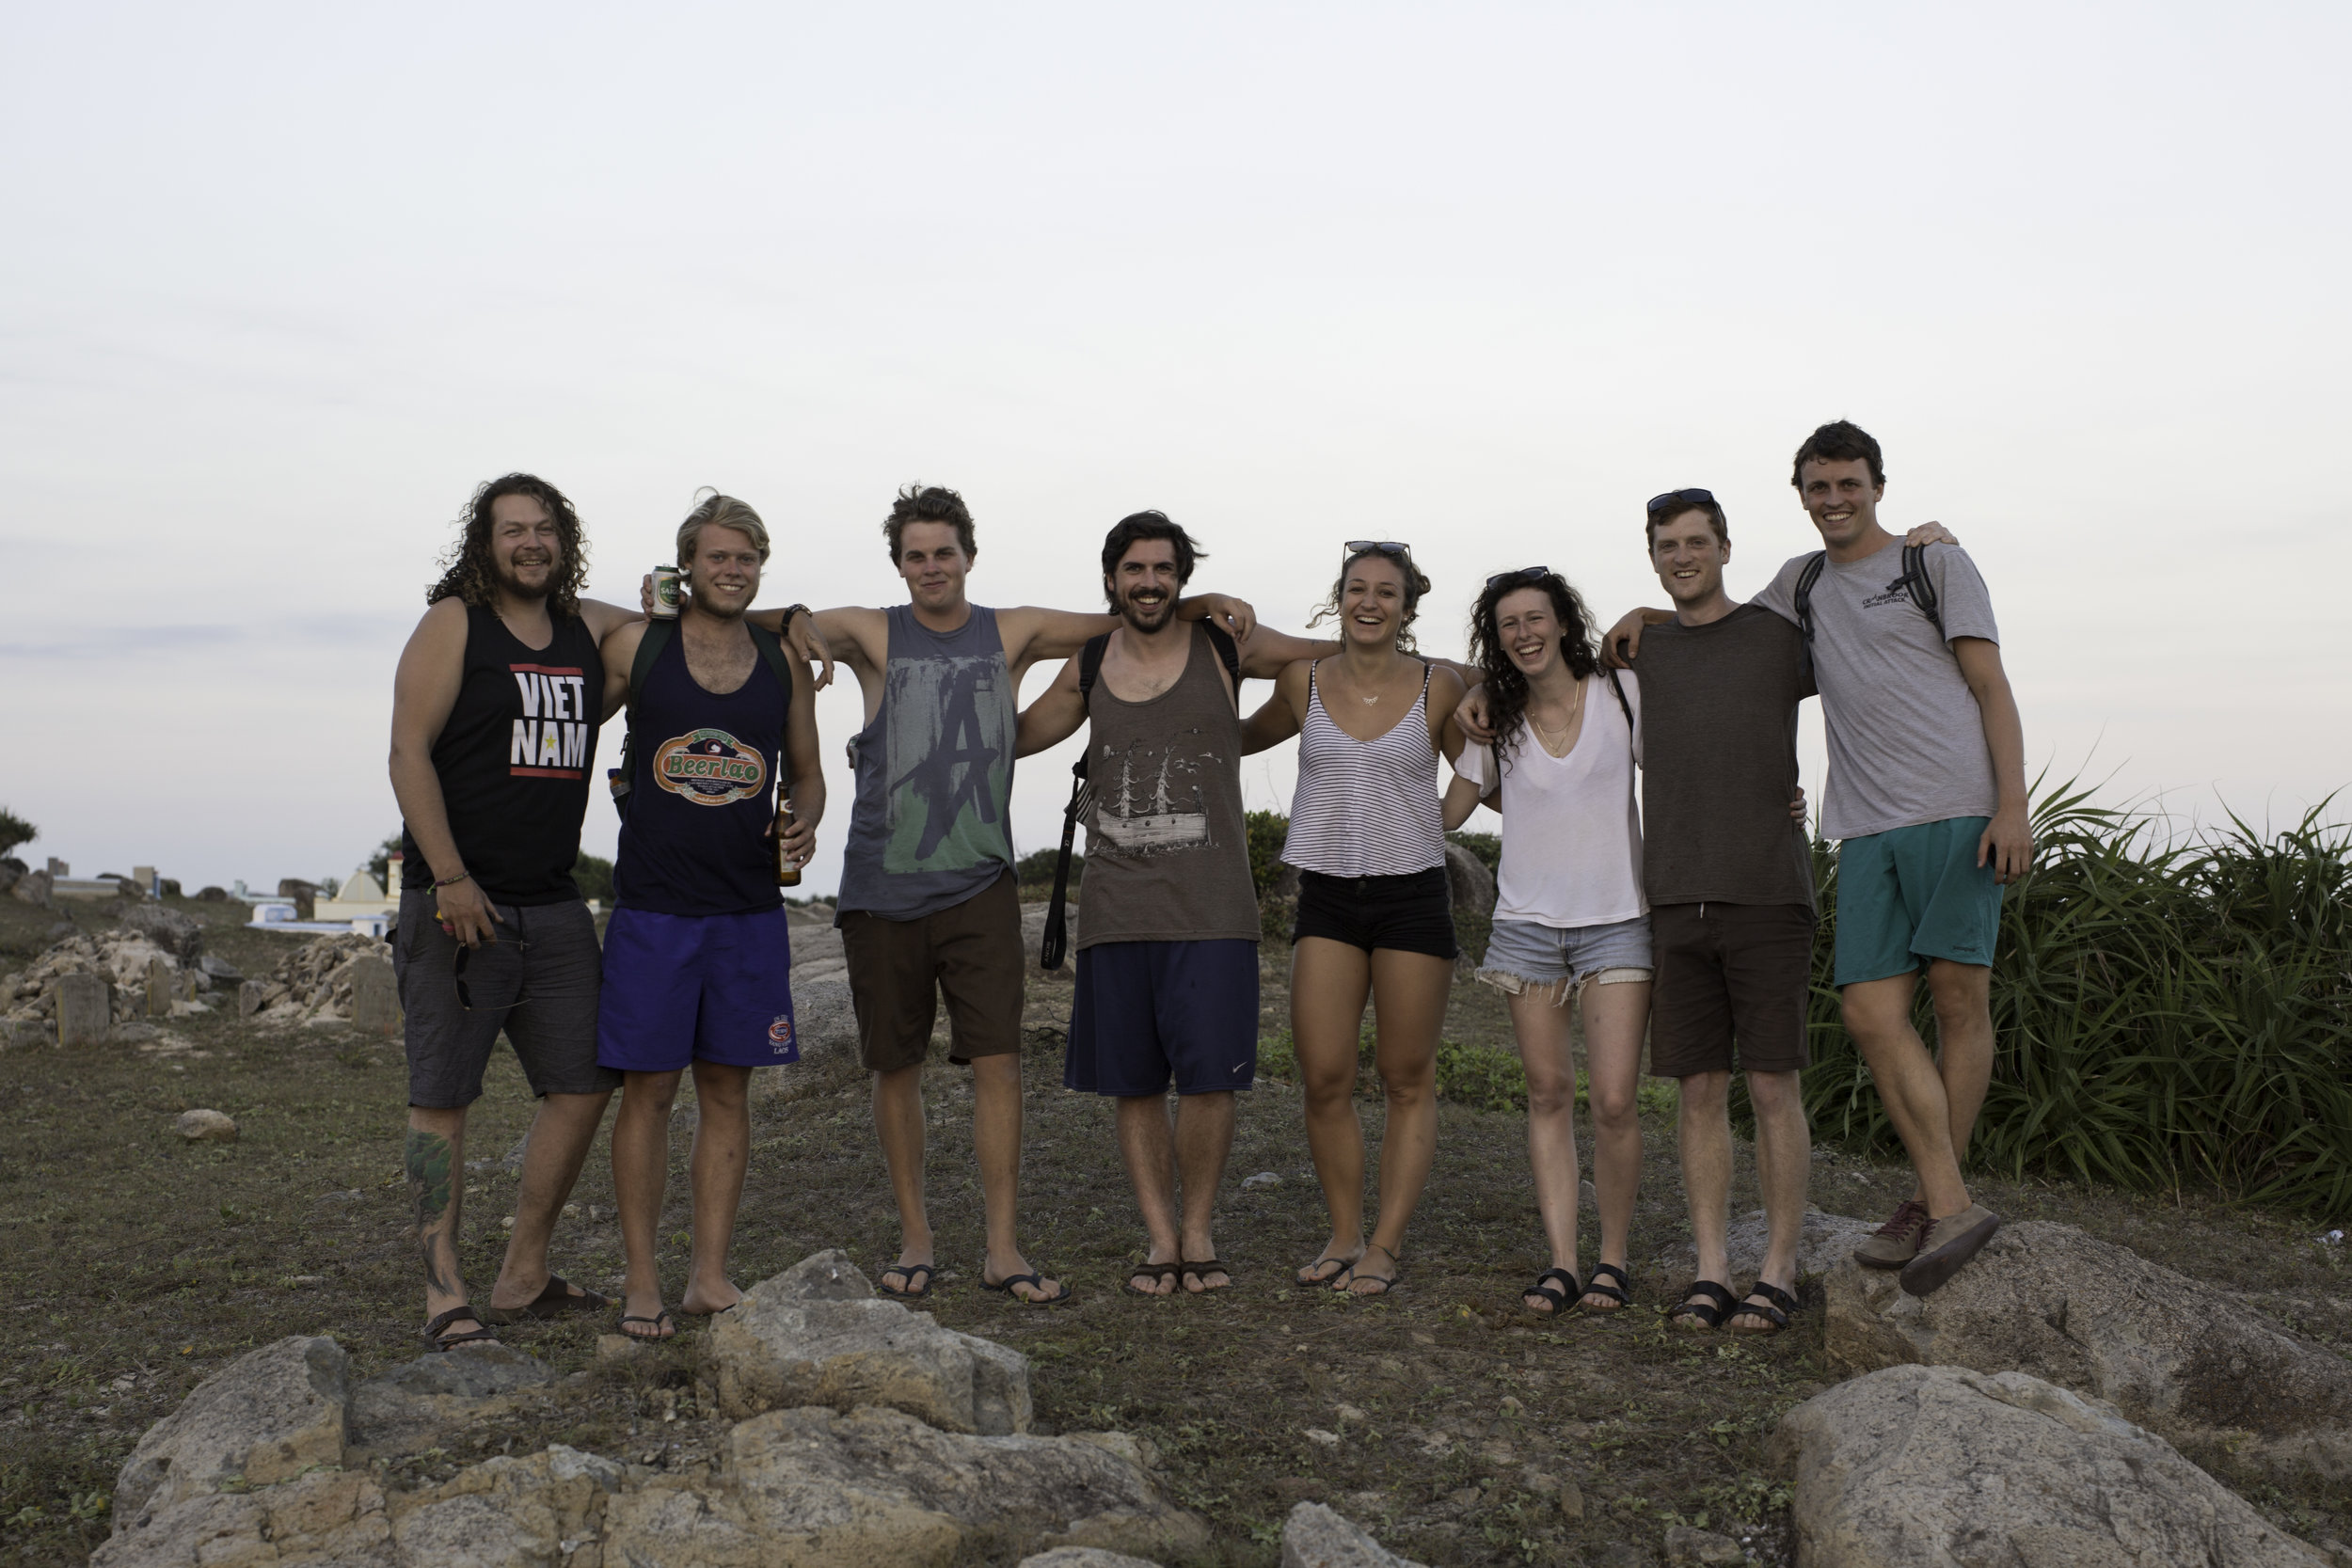 Surprised by a crew of Salt Springers and a German on my birthday -Ben, Kyle, Evan, Stu, Carina, Sallë, Kevan & me